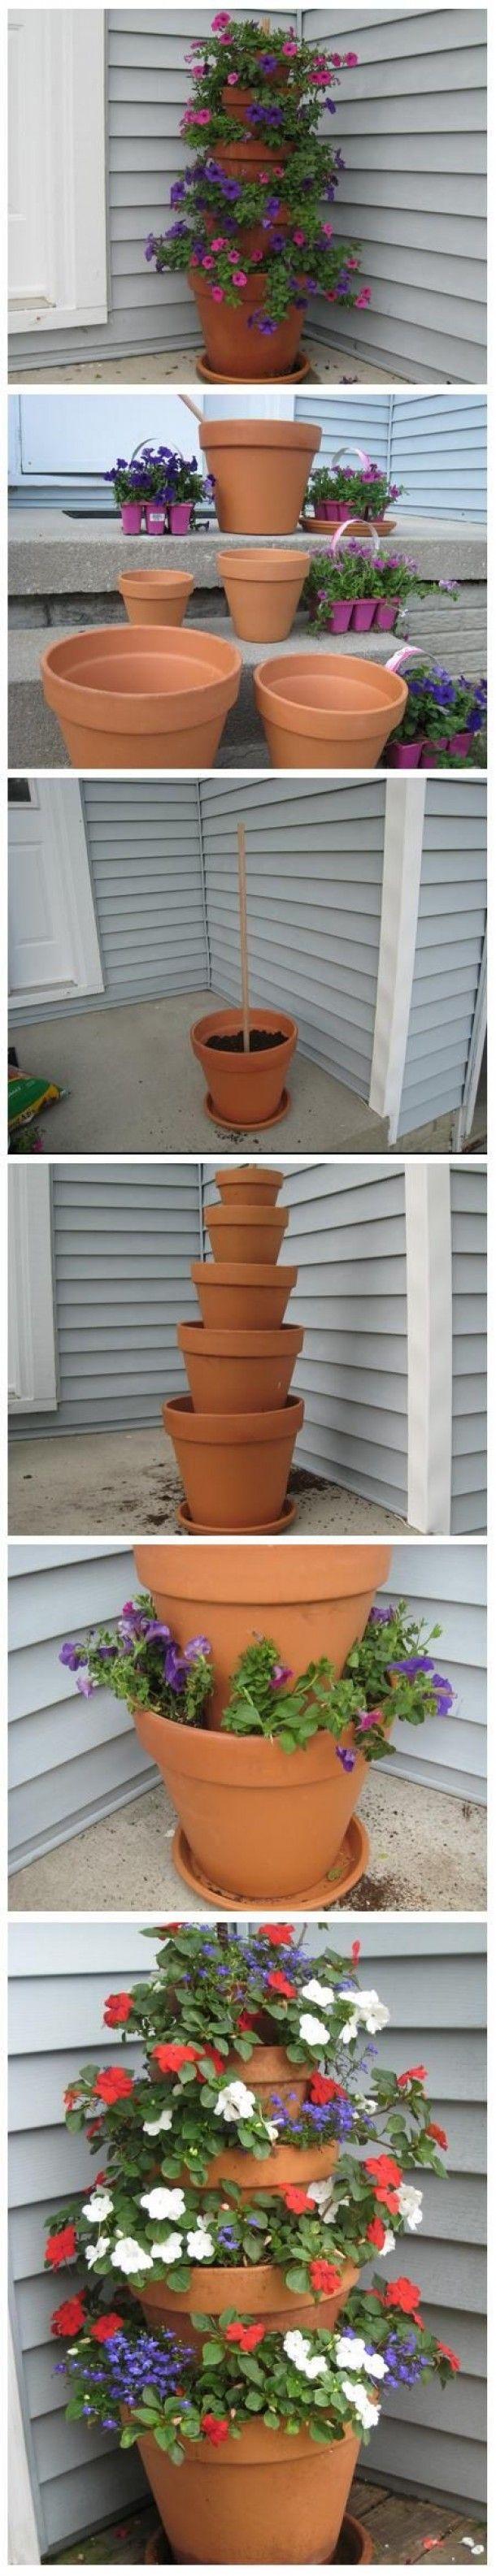 Cute planters.